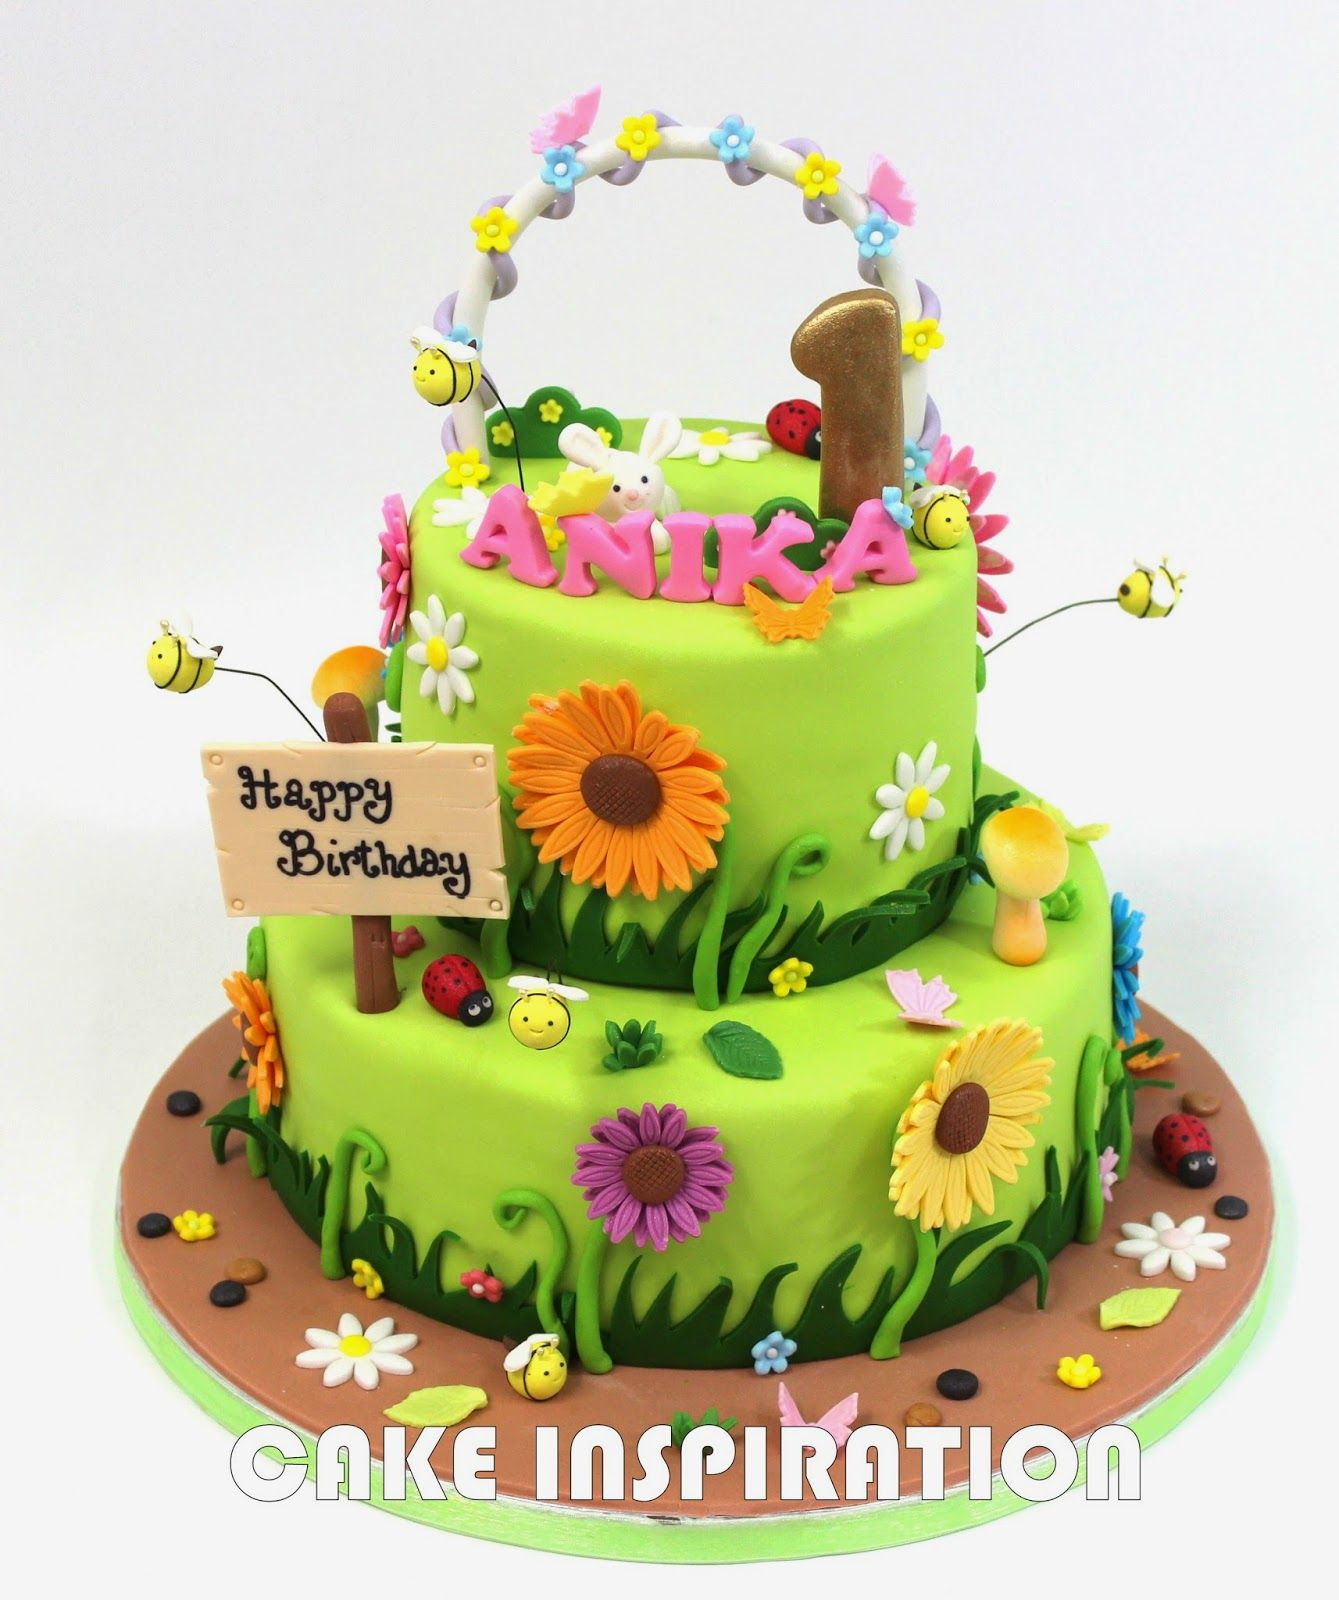 Garden Design Birthday Cake garden themed cake ideas theme daisy theme flower theme cake